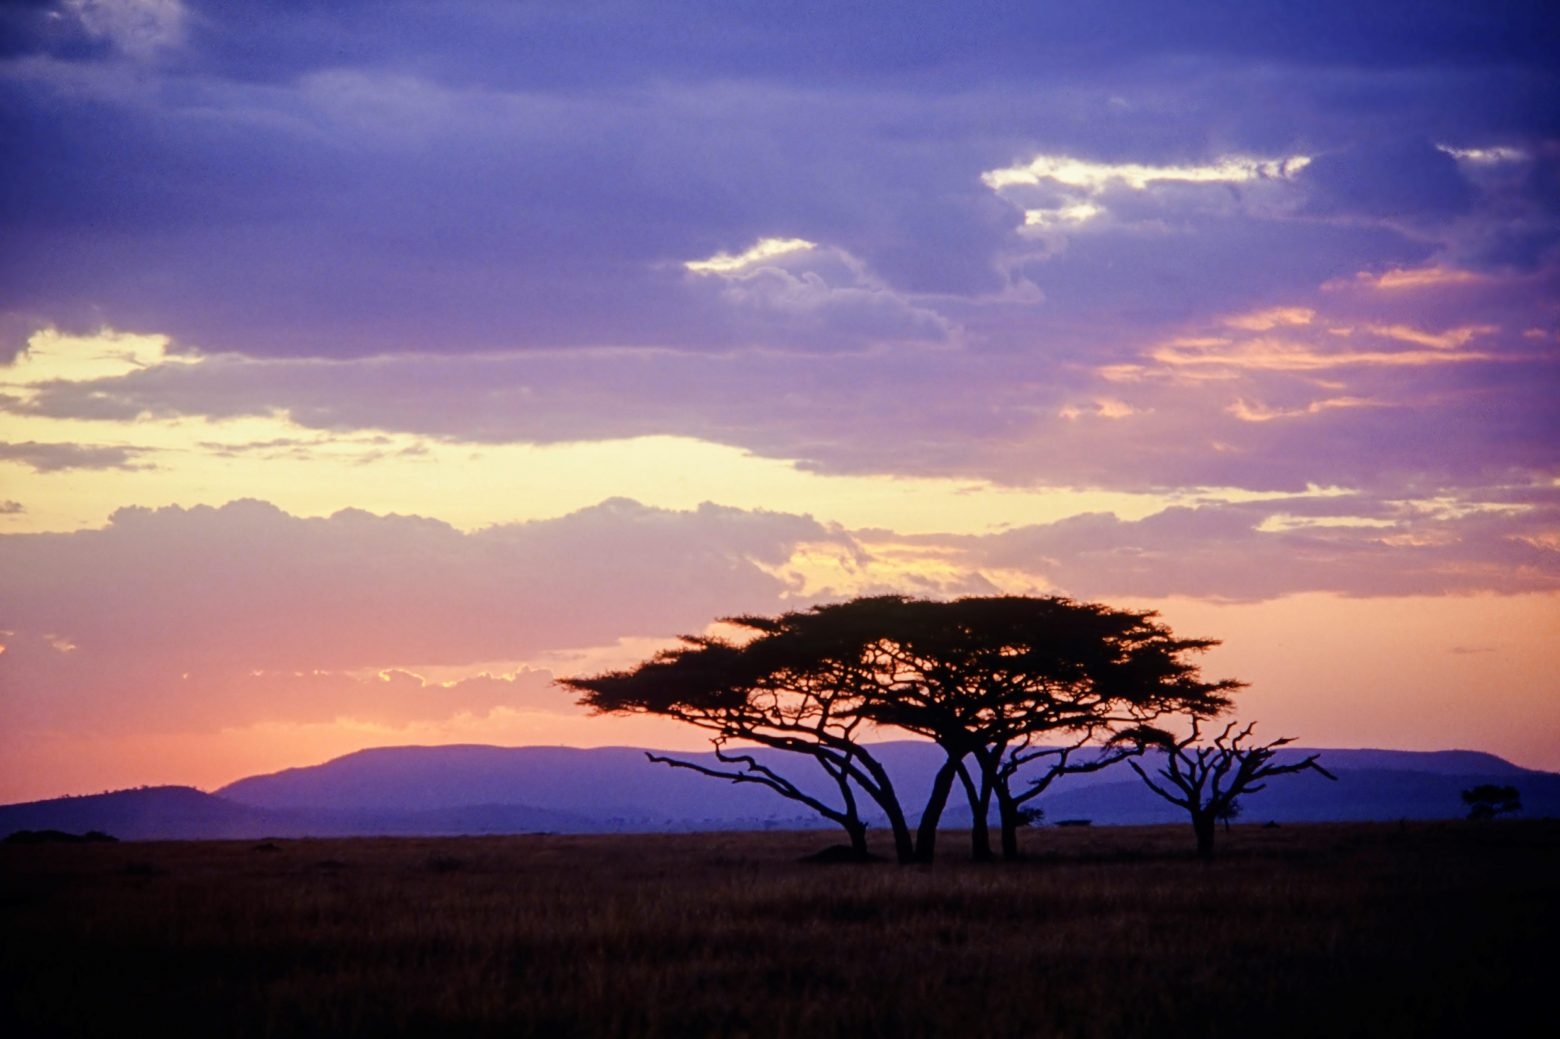 Free stock photo Serengeti sunset with Acacia trees